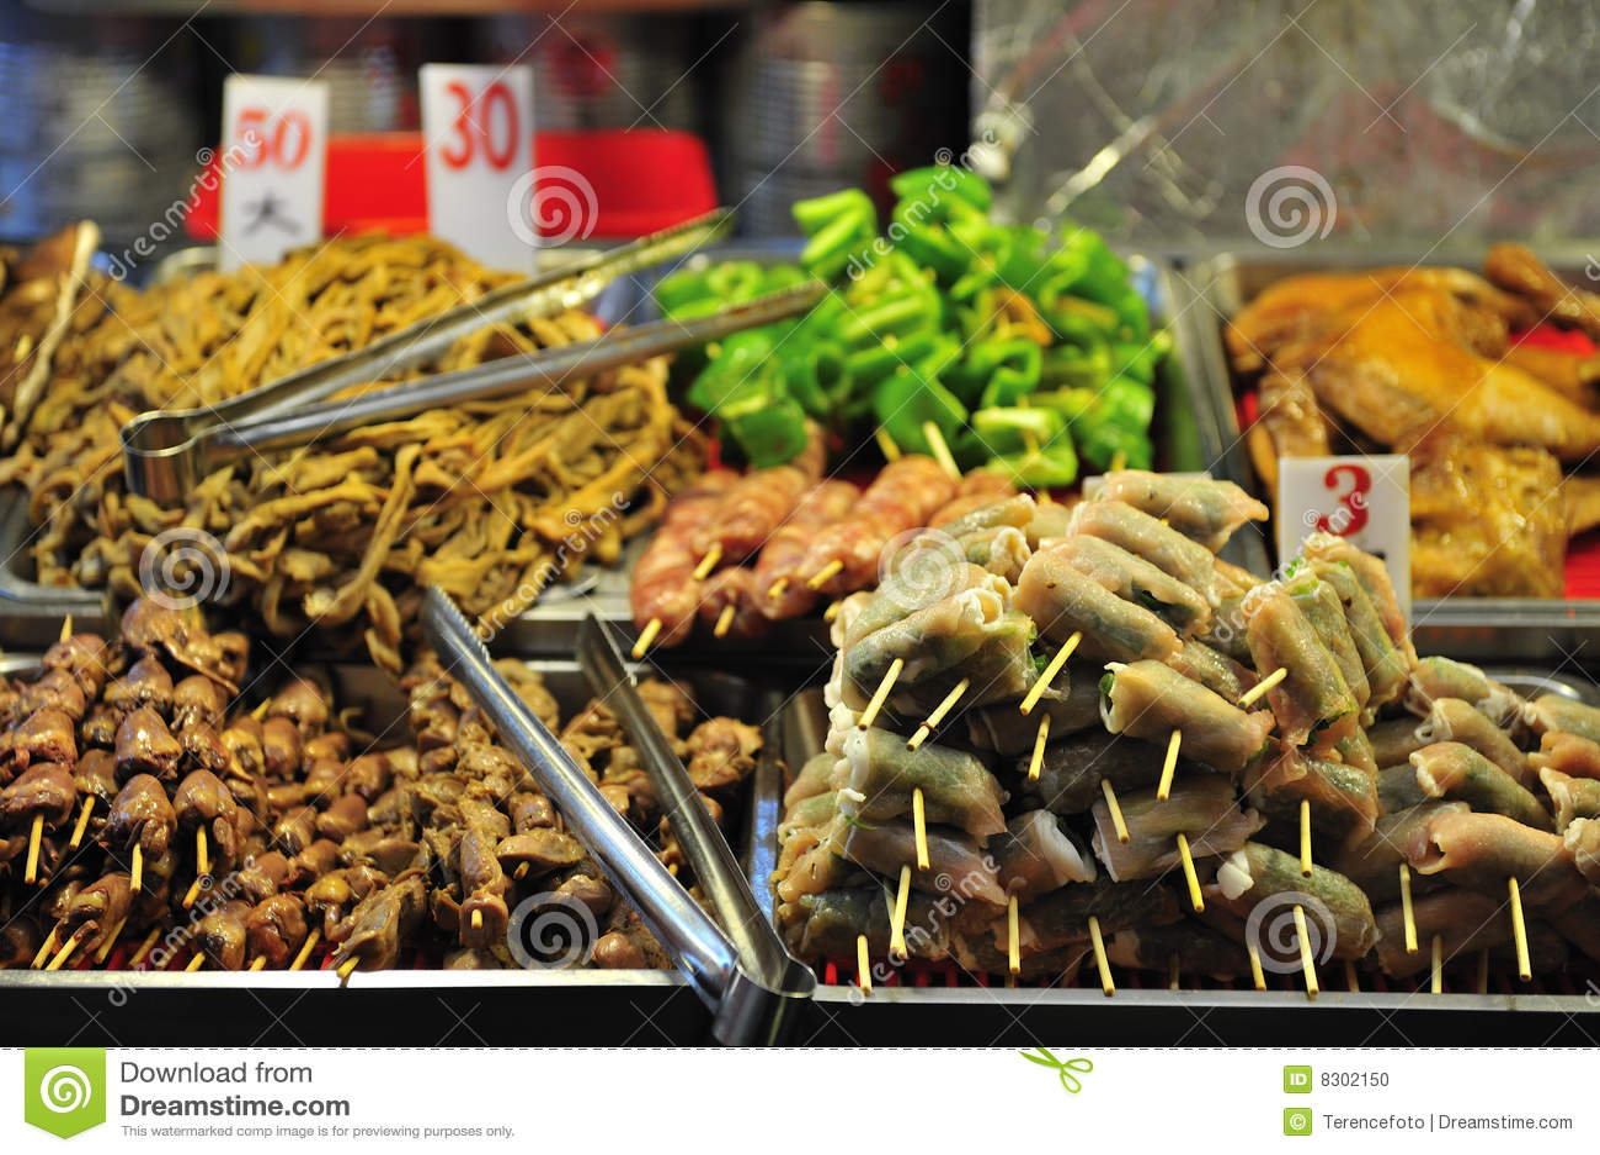 Barbecued Food in Taiwan Night Market